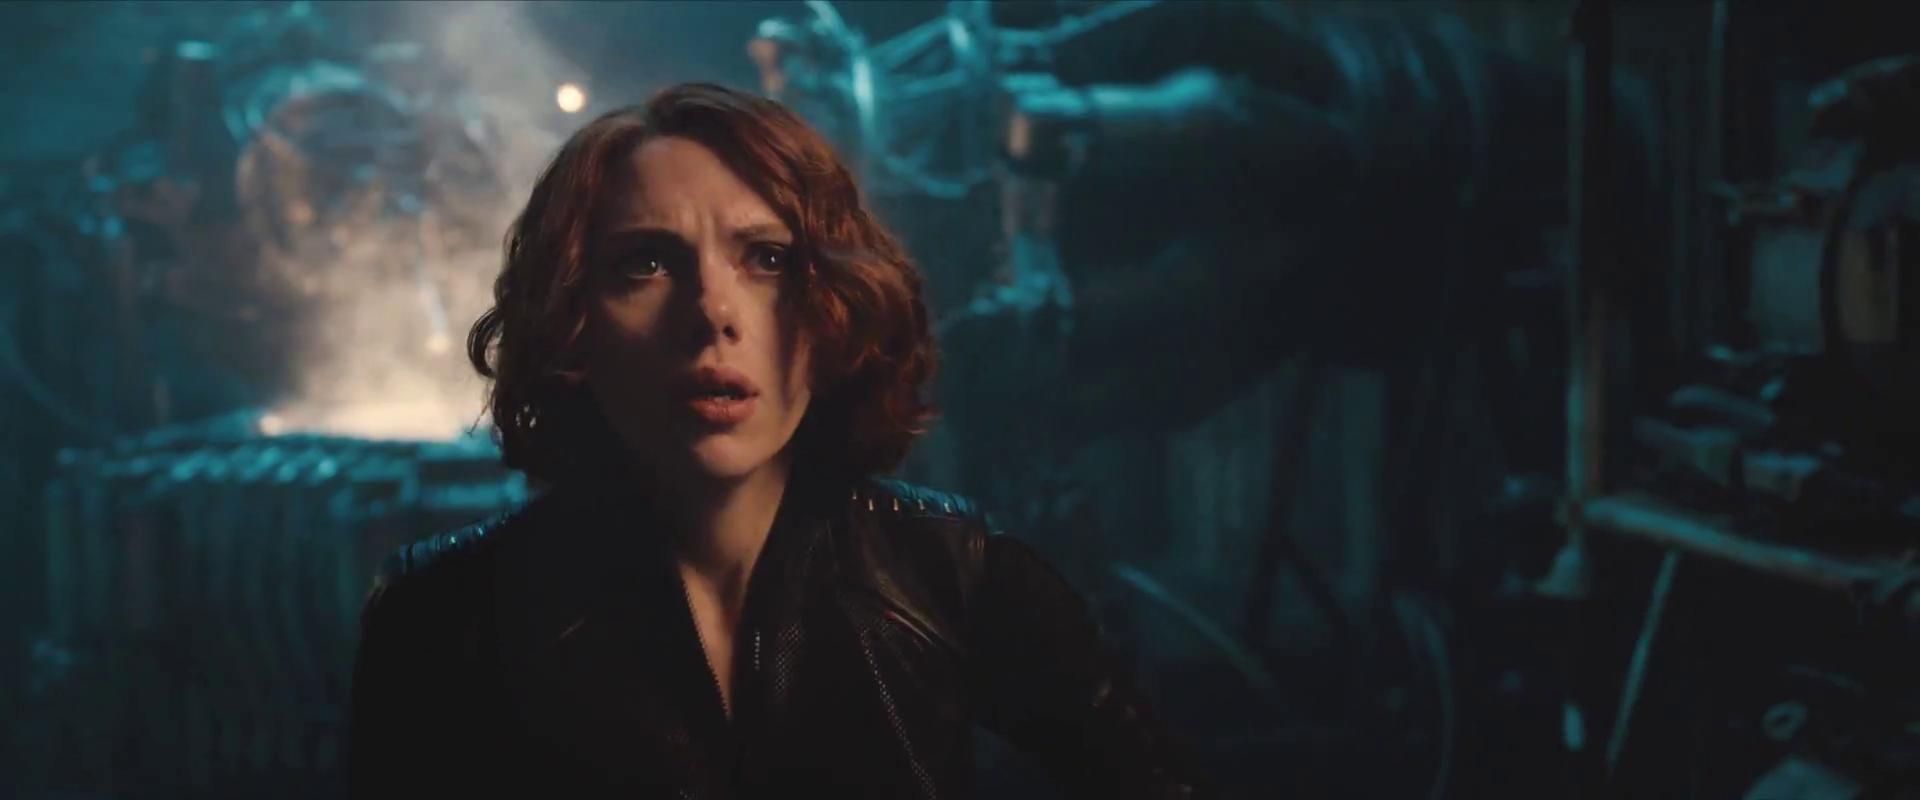 avengers-age-of-ultron-trailer-screengrab-25-scarlett-johansson.png